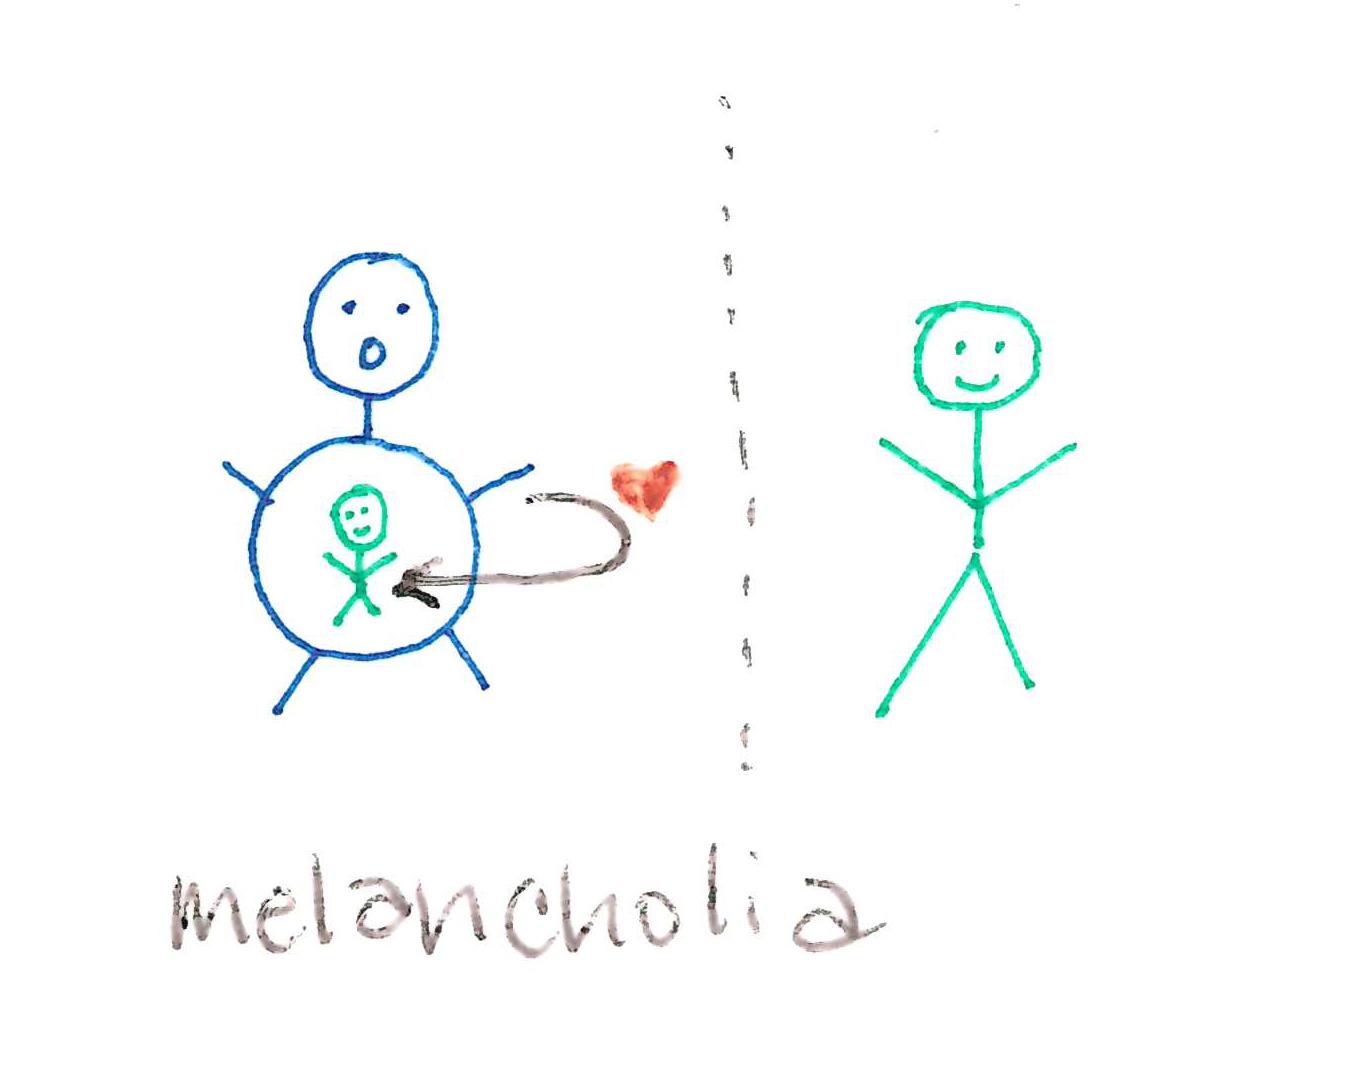 Natalia's stick-figure cartoon illustrating regular object-cathexis versus melancholia